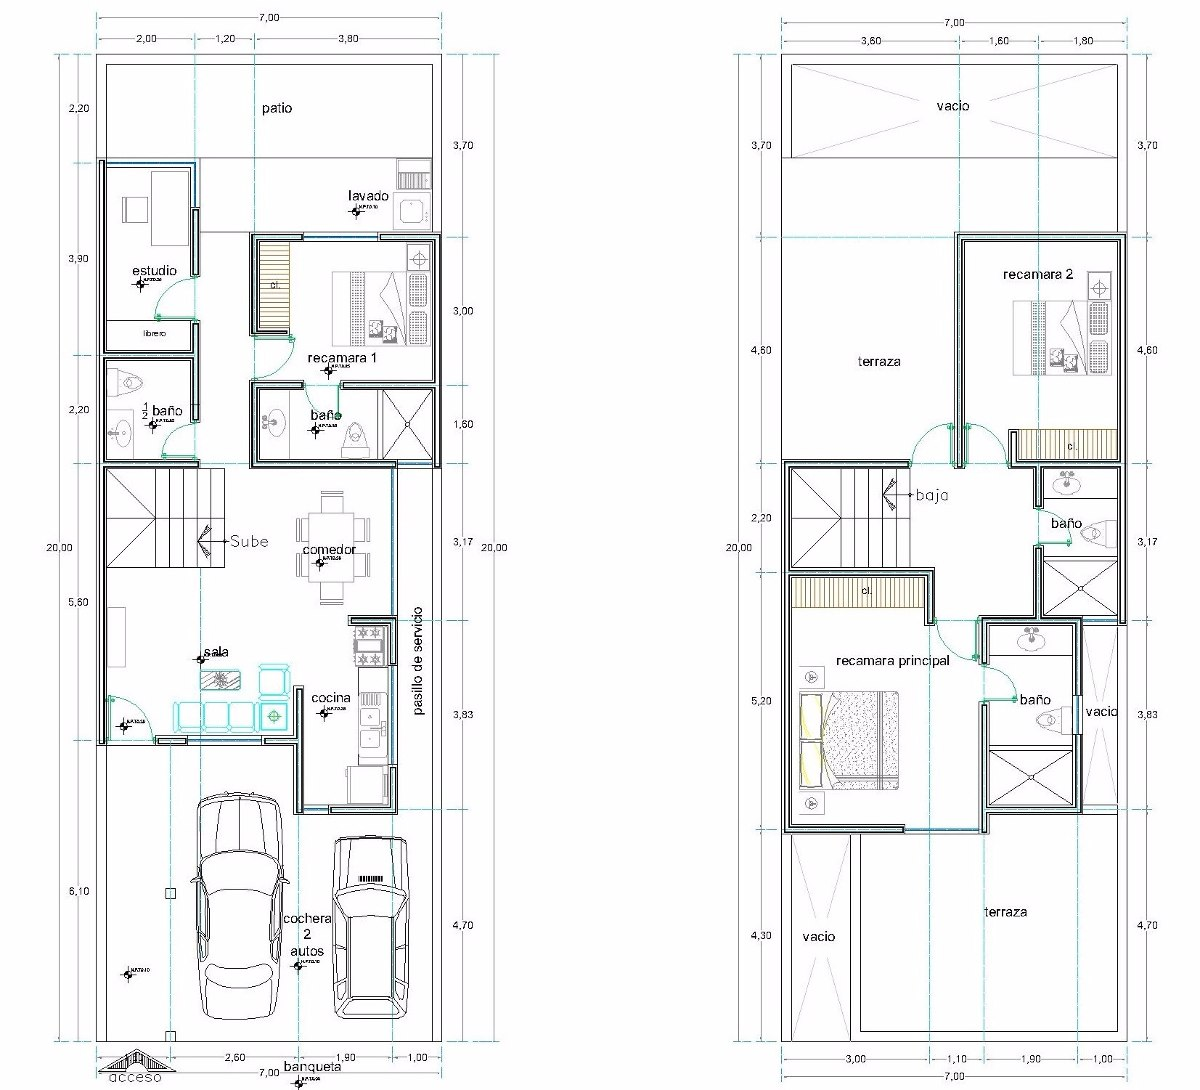 10 planos arquitectonicos dwg y pdf en On pdf planos arquitectonicos